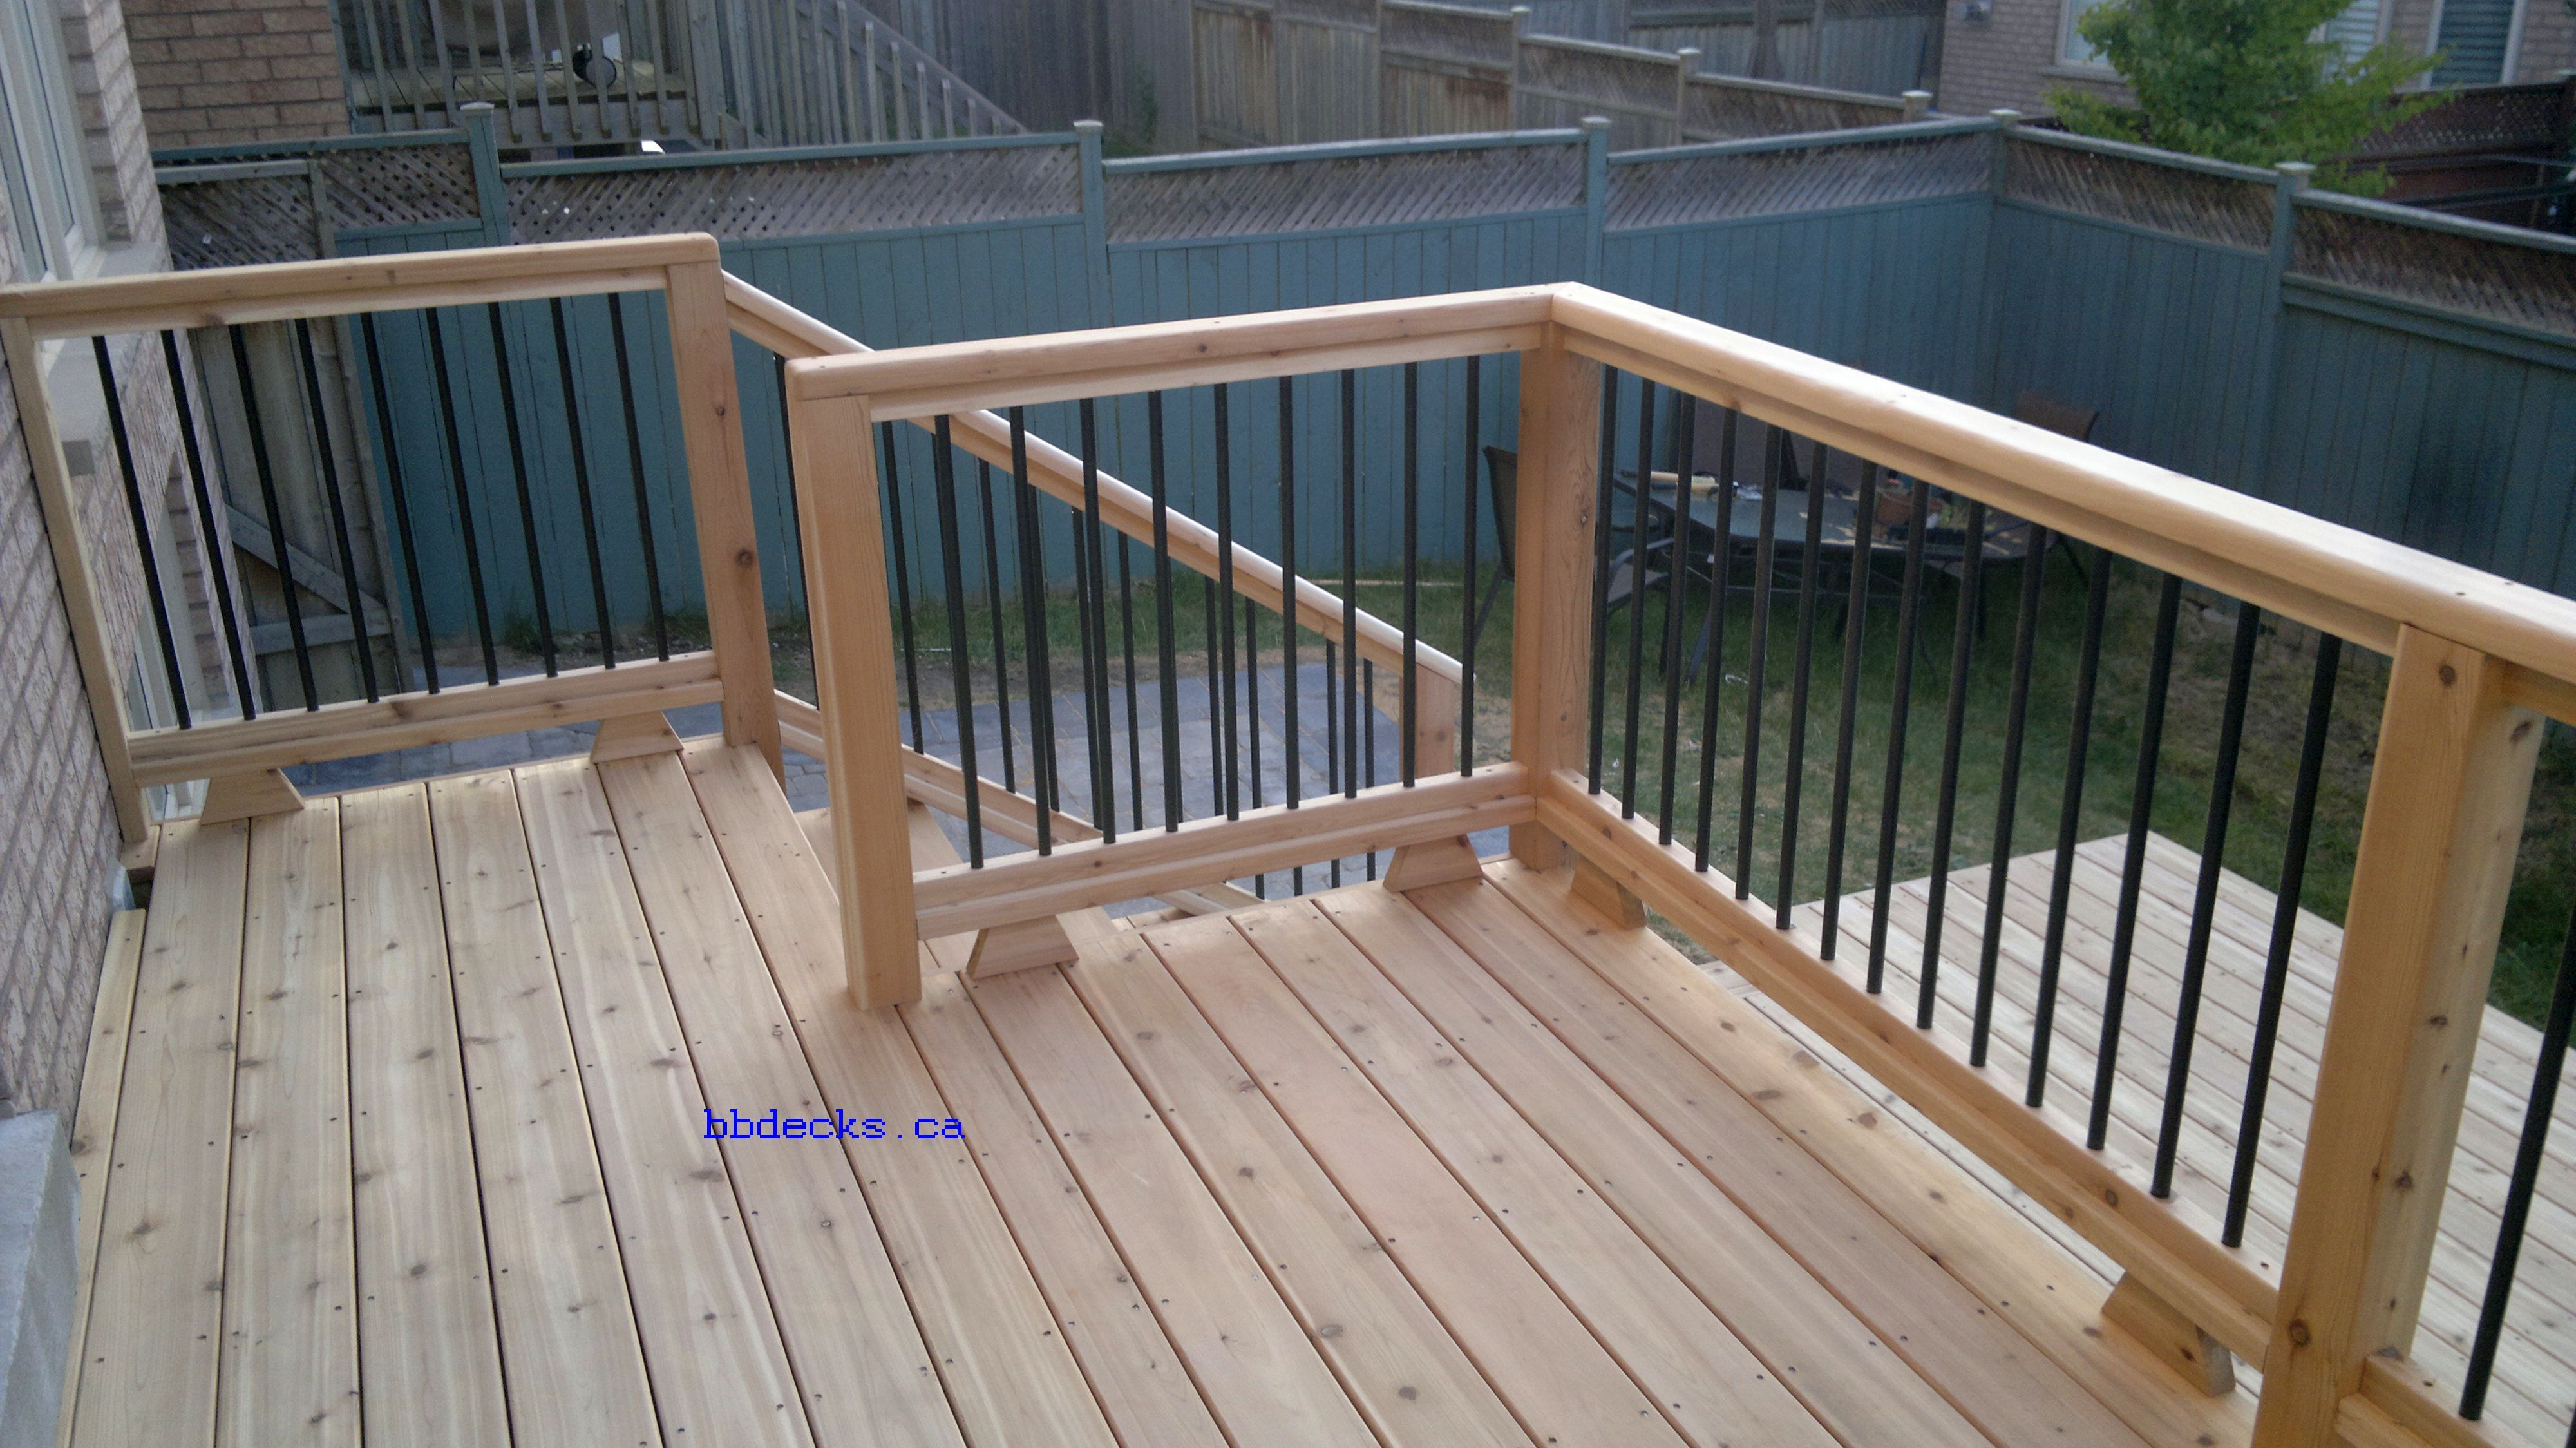 Best Metal Railings For Decks Rod Iron Railings February 7 400 x 300